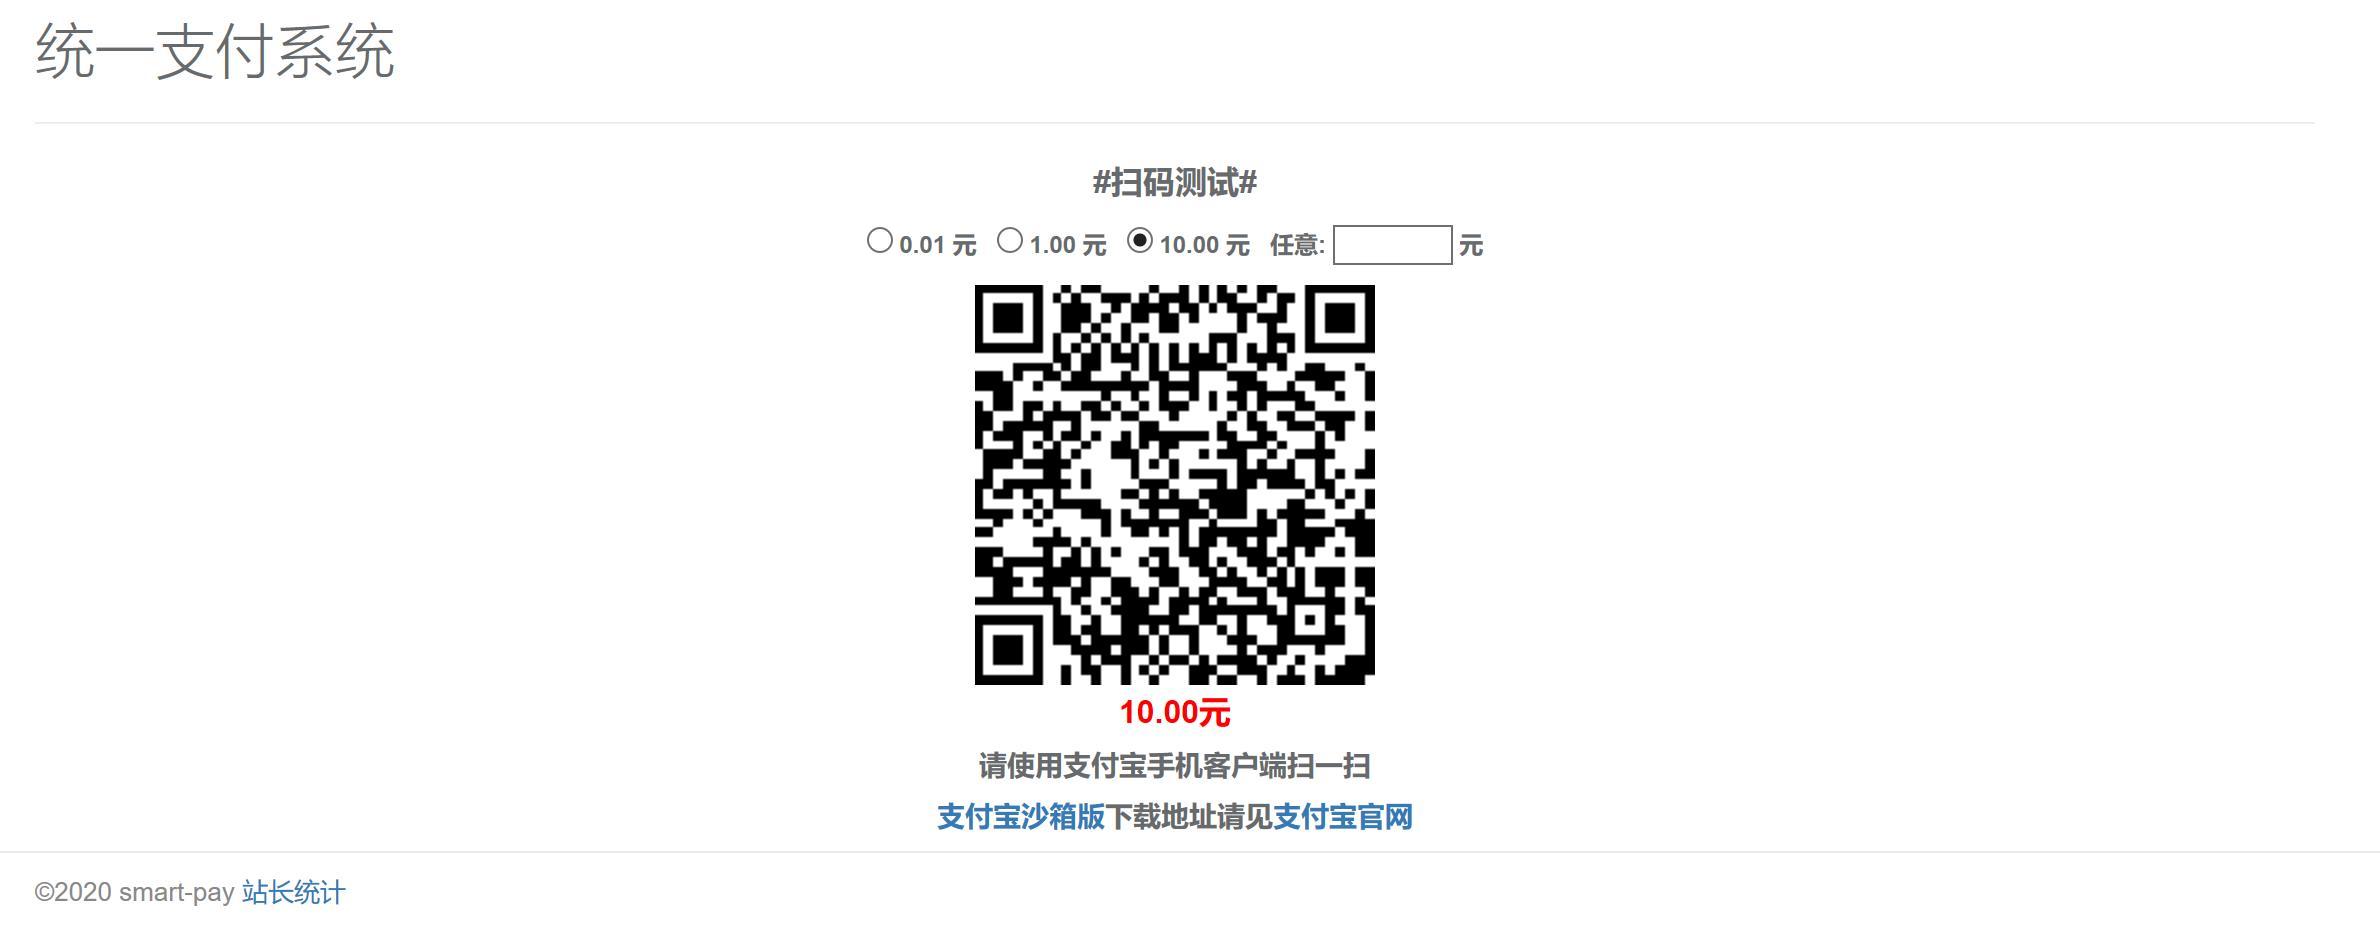 http://122.51.99.227:9009/demo/smartQrPay.html